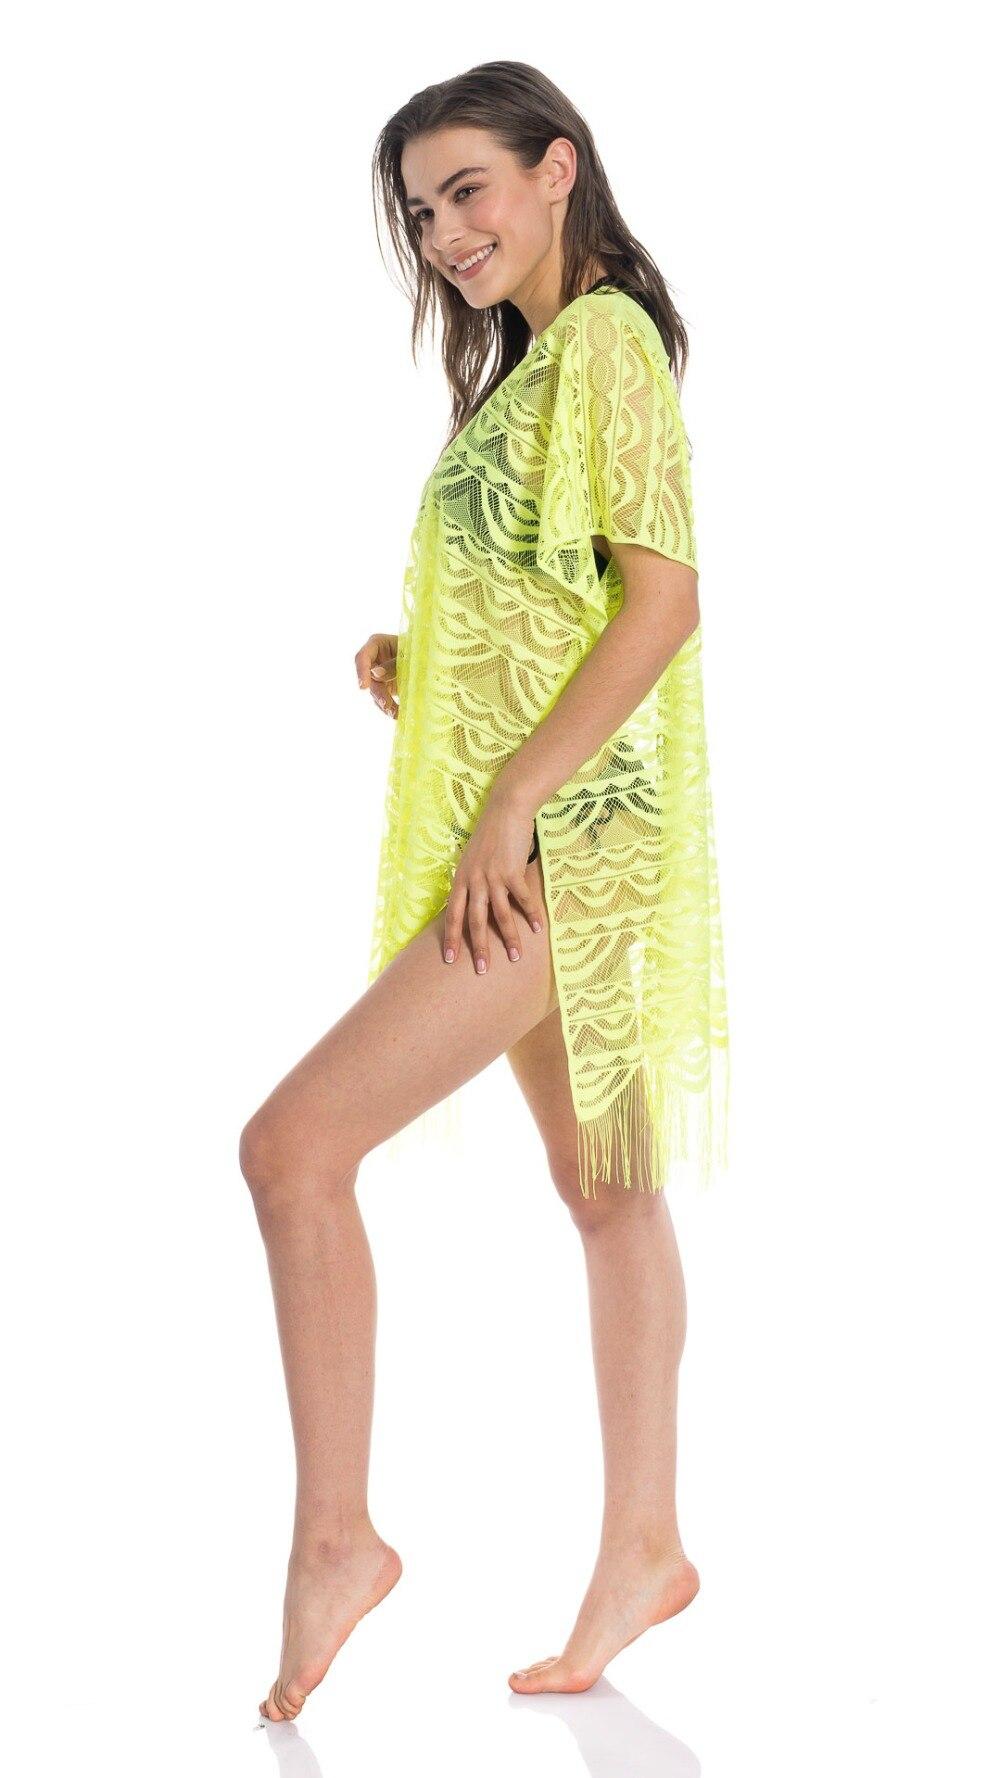 2020 Summer Women Swimsuit New Sexy Sling Beach Cover Ups Sarong  Bikini  Wrap Pareo Beach Dress Ropa de Playa  Traje de Bañyo best price best product hot sale